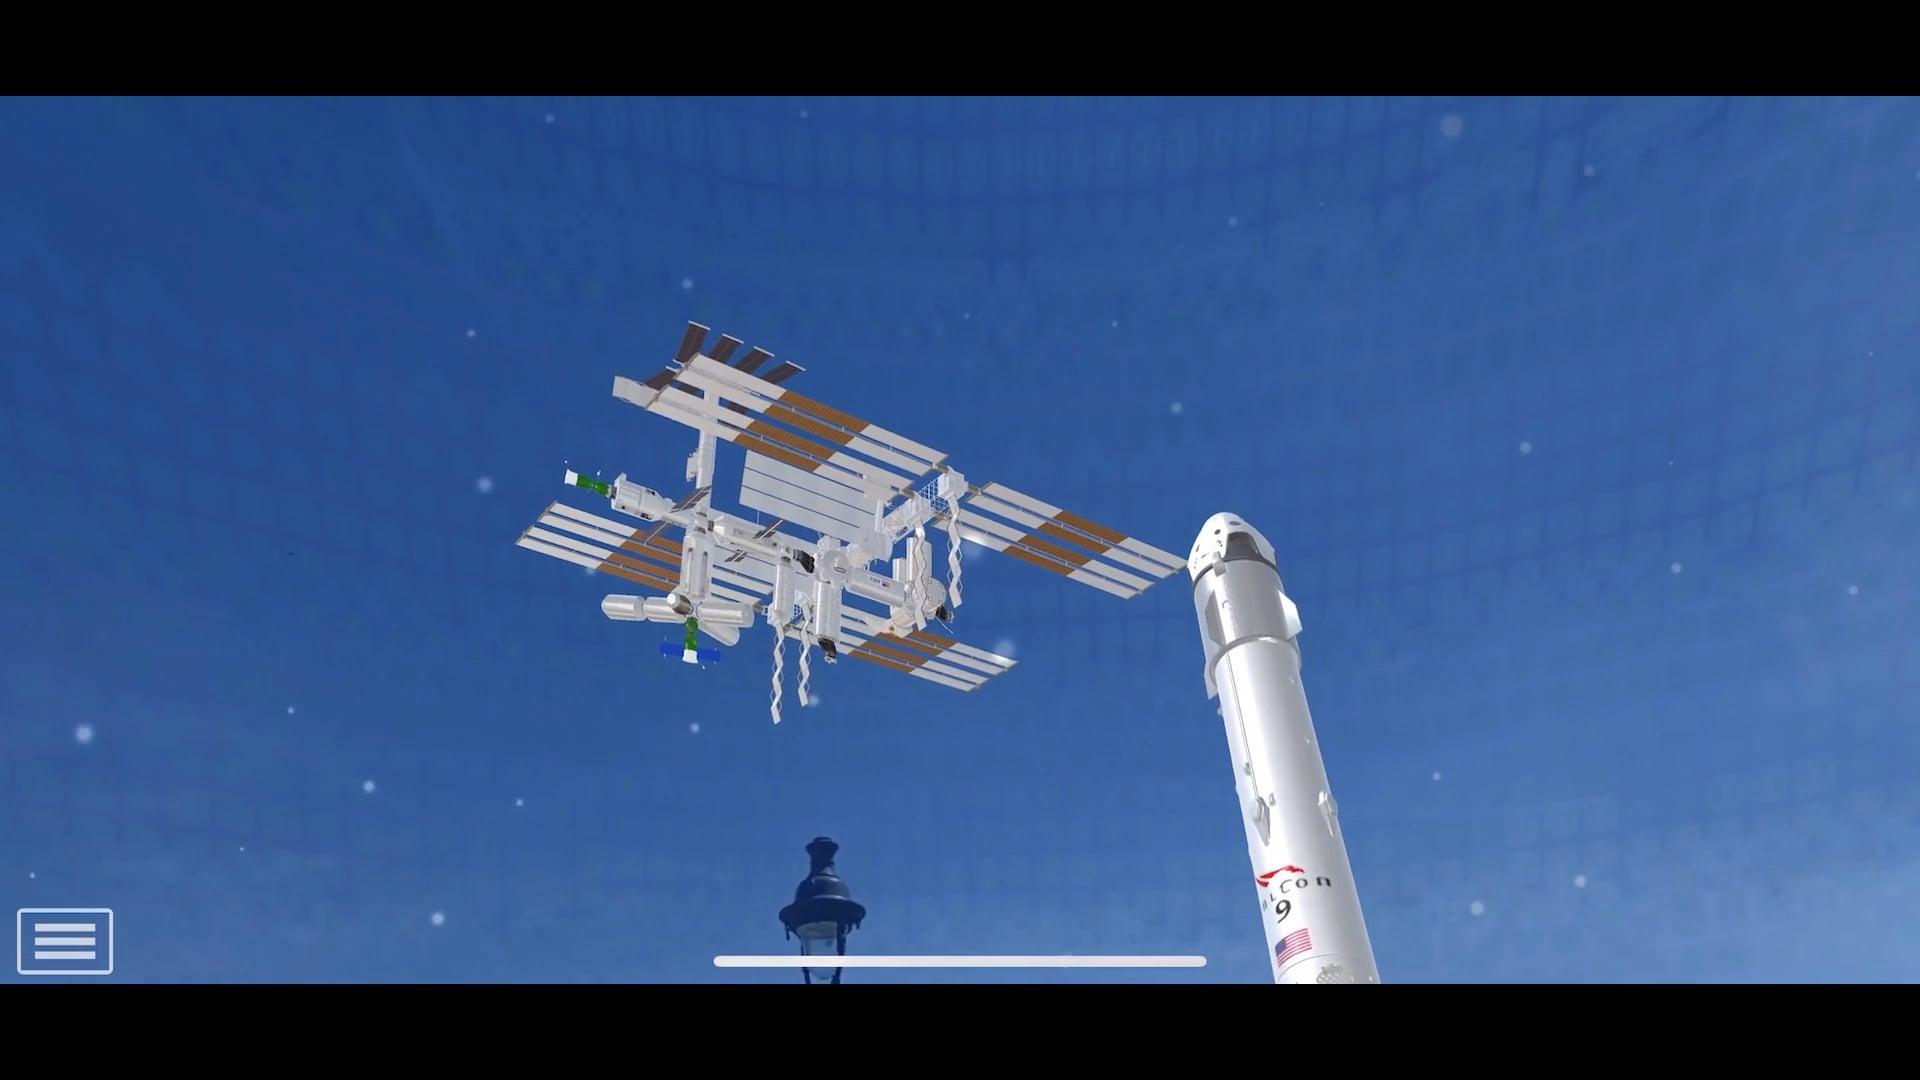 AR_SPACEX_Bemersive